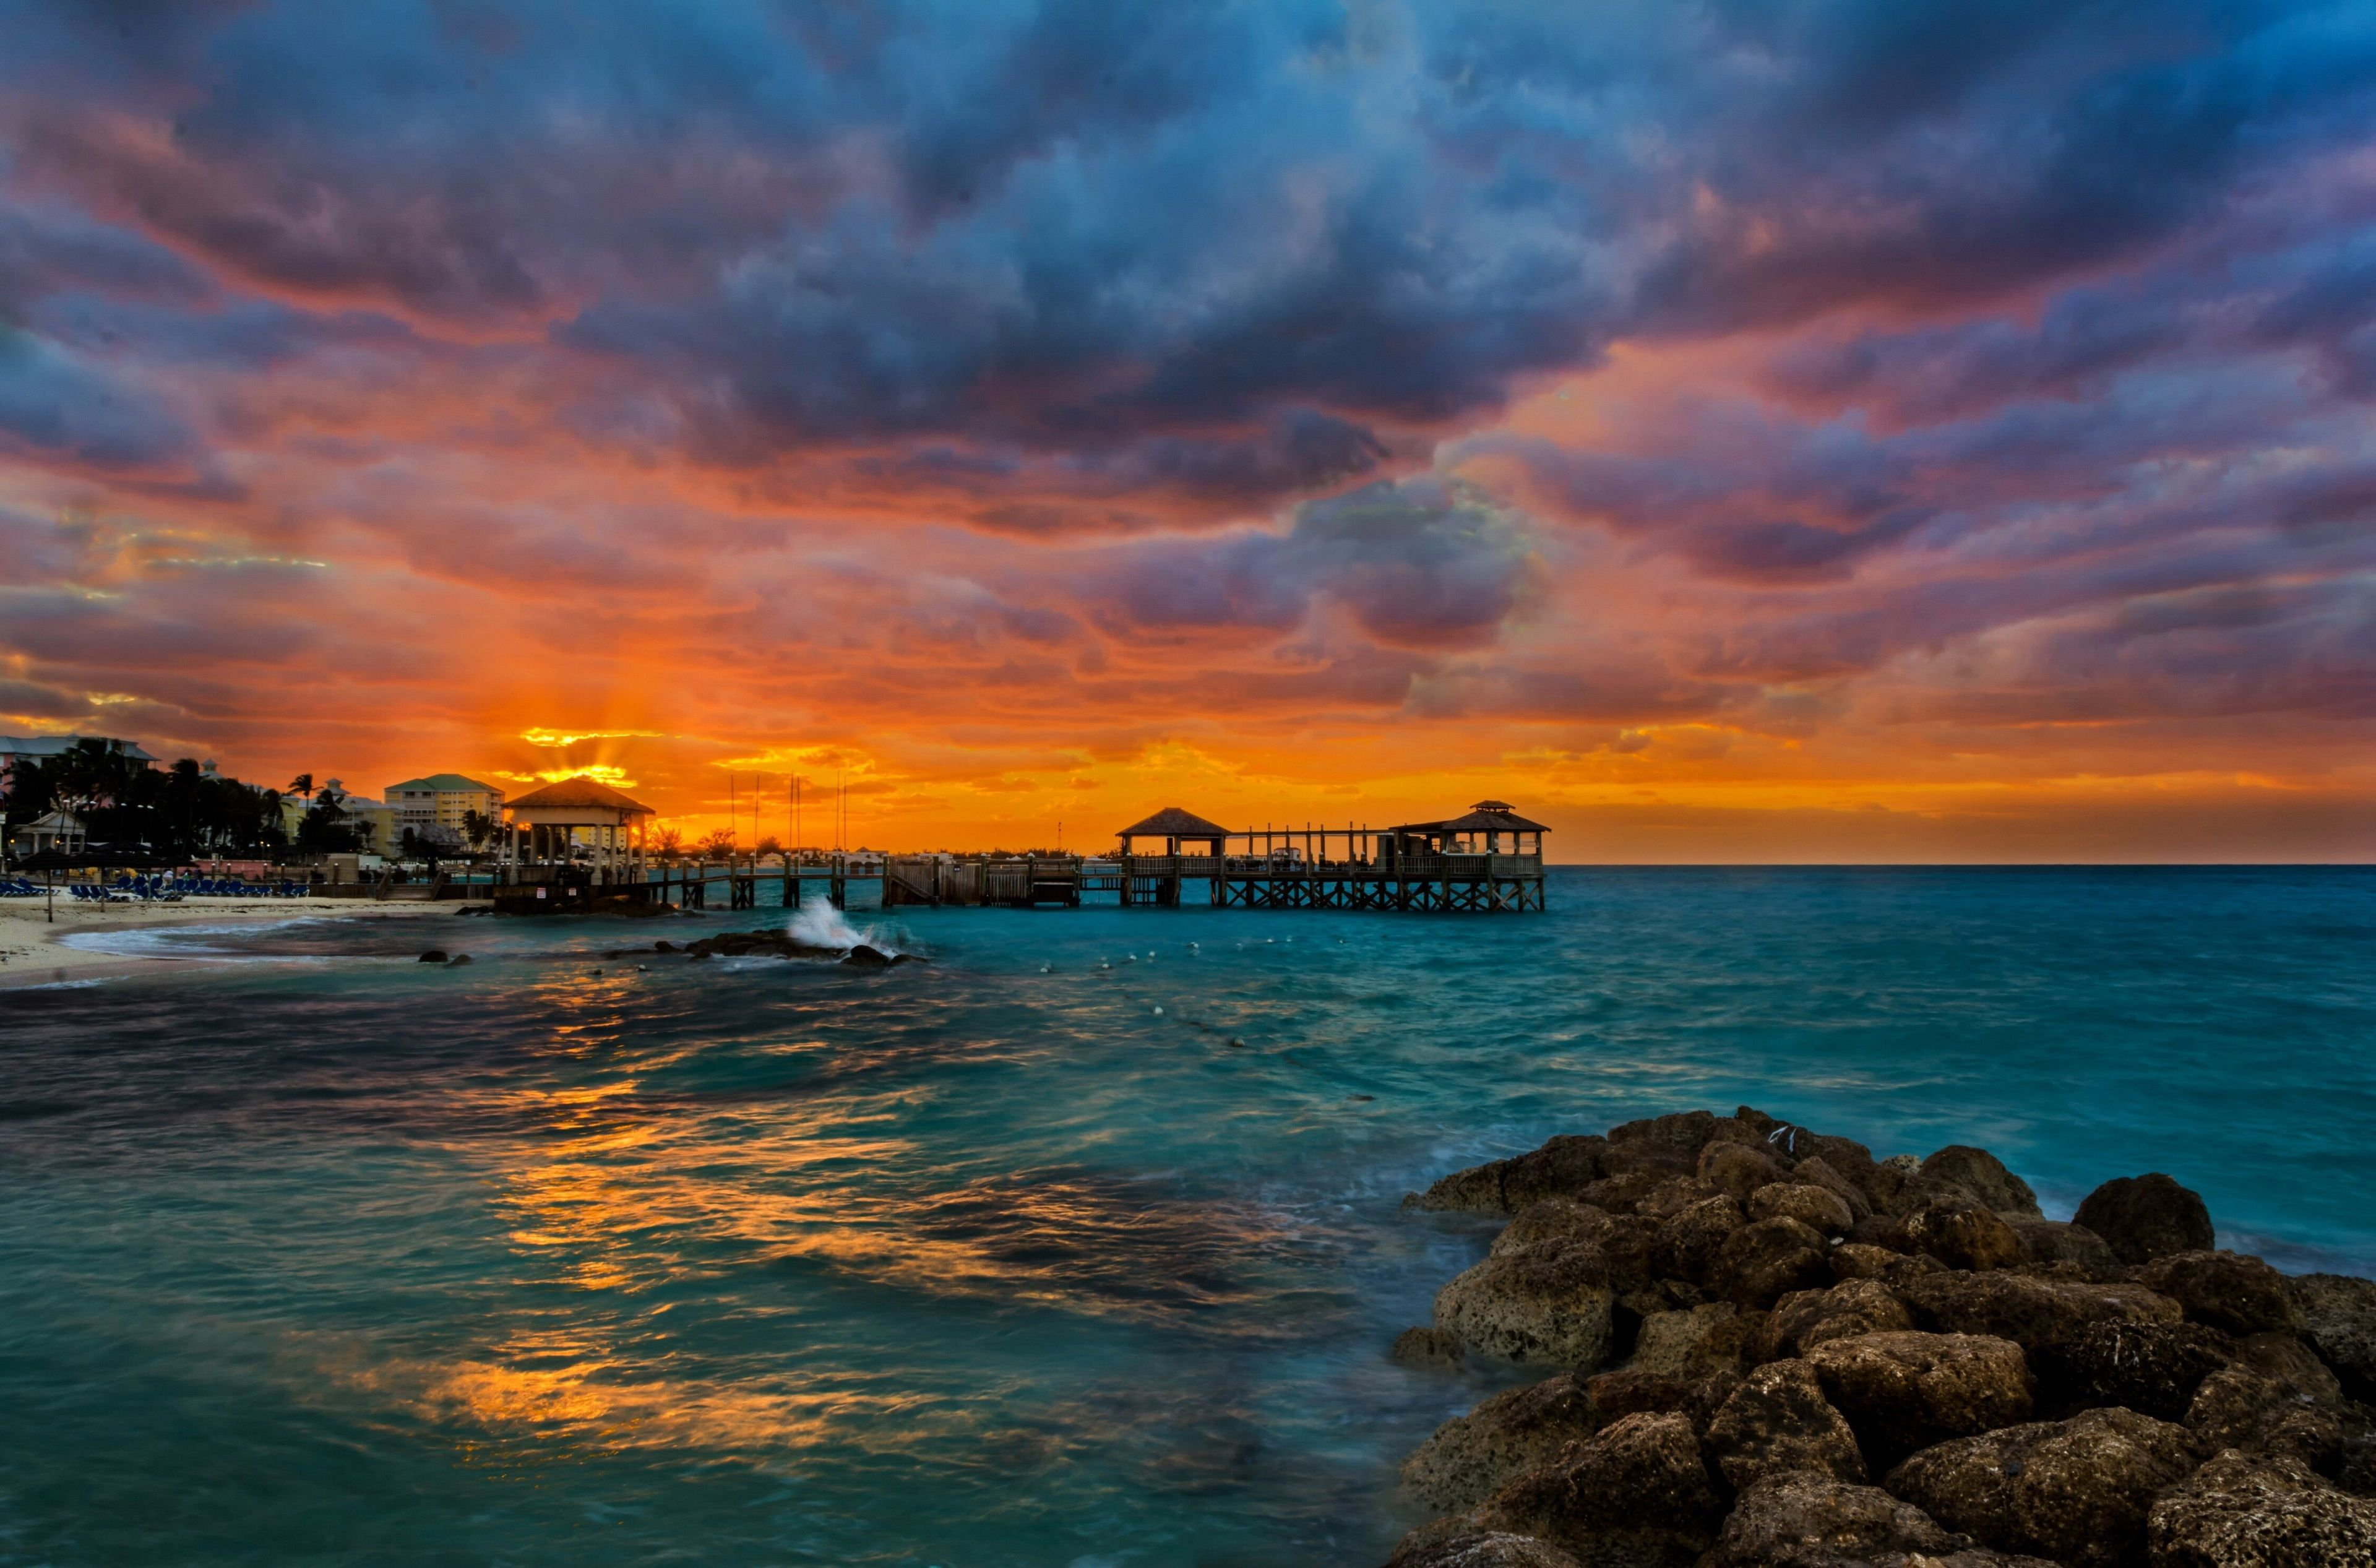 3840x2534 Sea 4k Downloading Wallpaper For Pc Beach Sunset Wallpaper Sunset Wallpaper Landscape Wallpaper